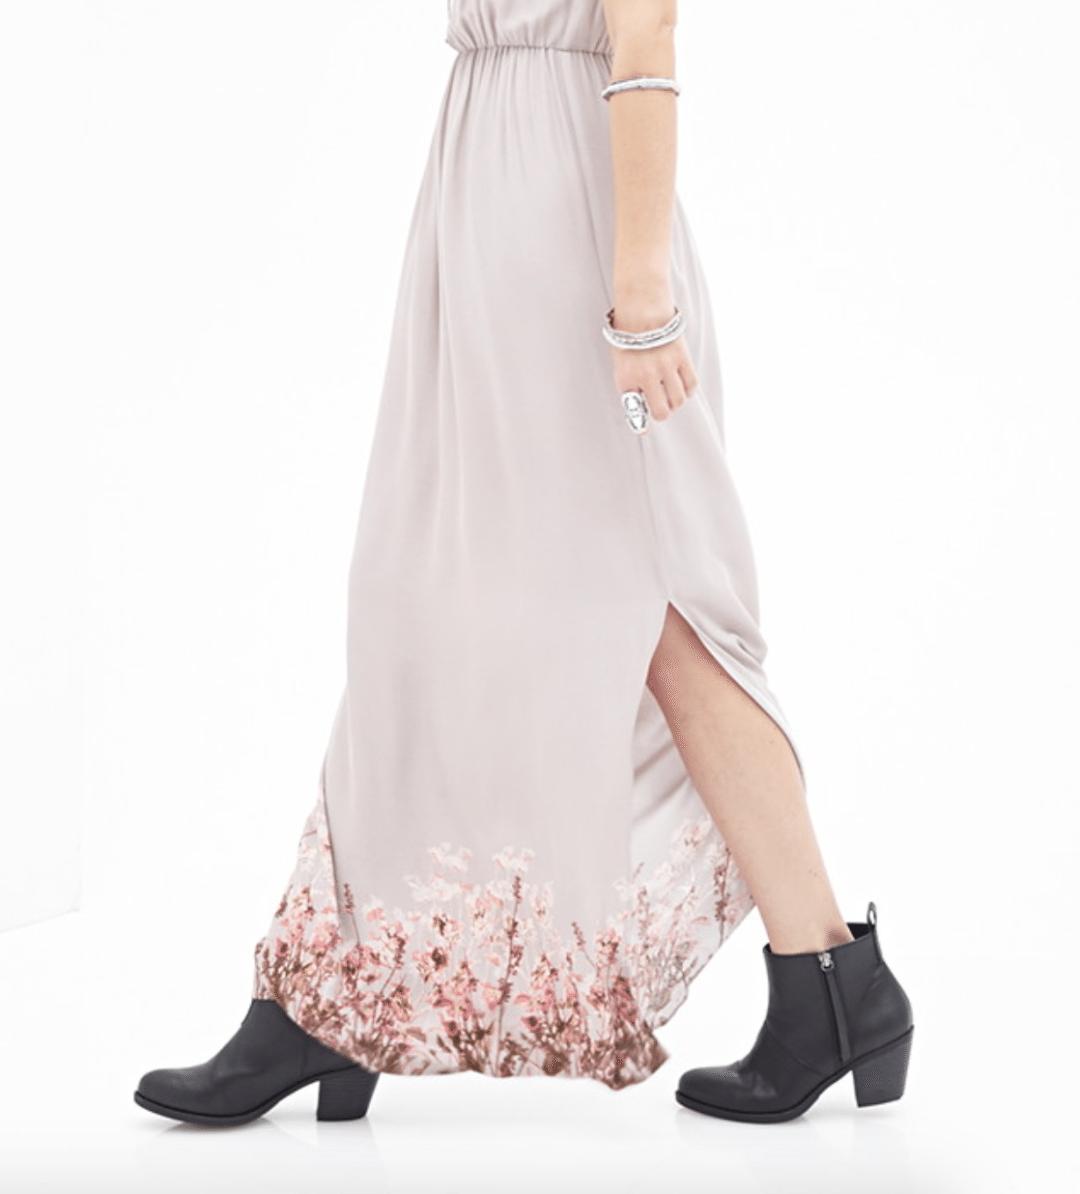 Summer maxi dresses under $30 // thinkelysian.com